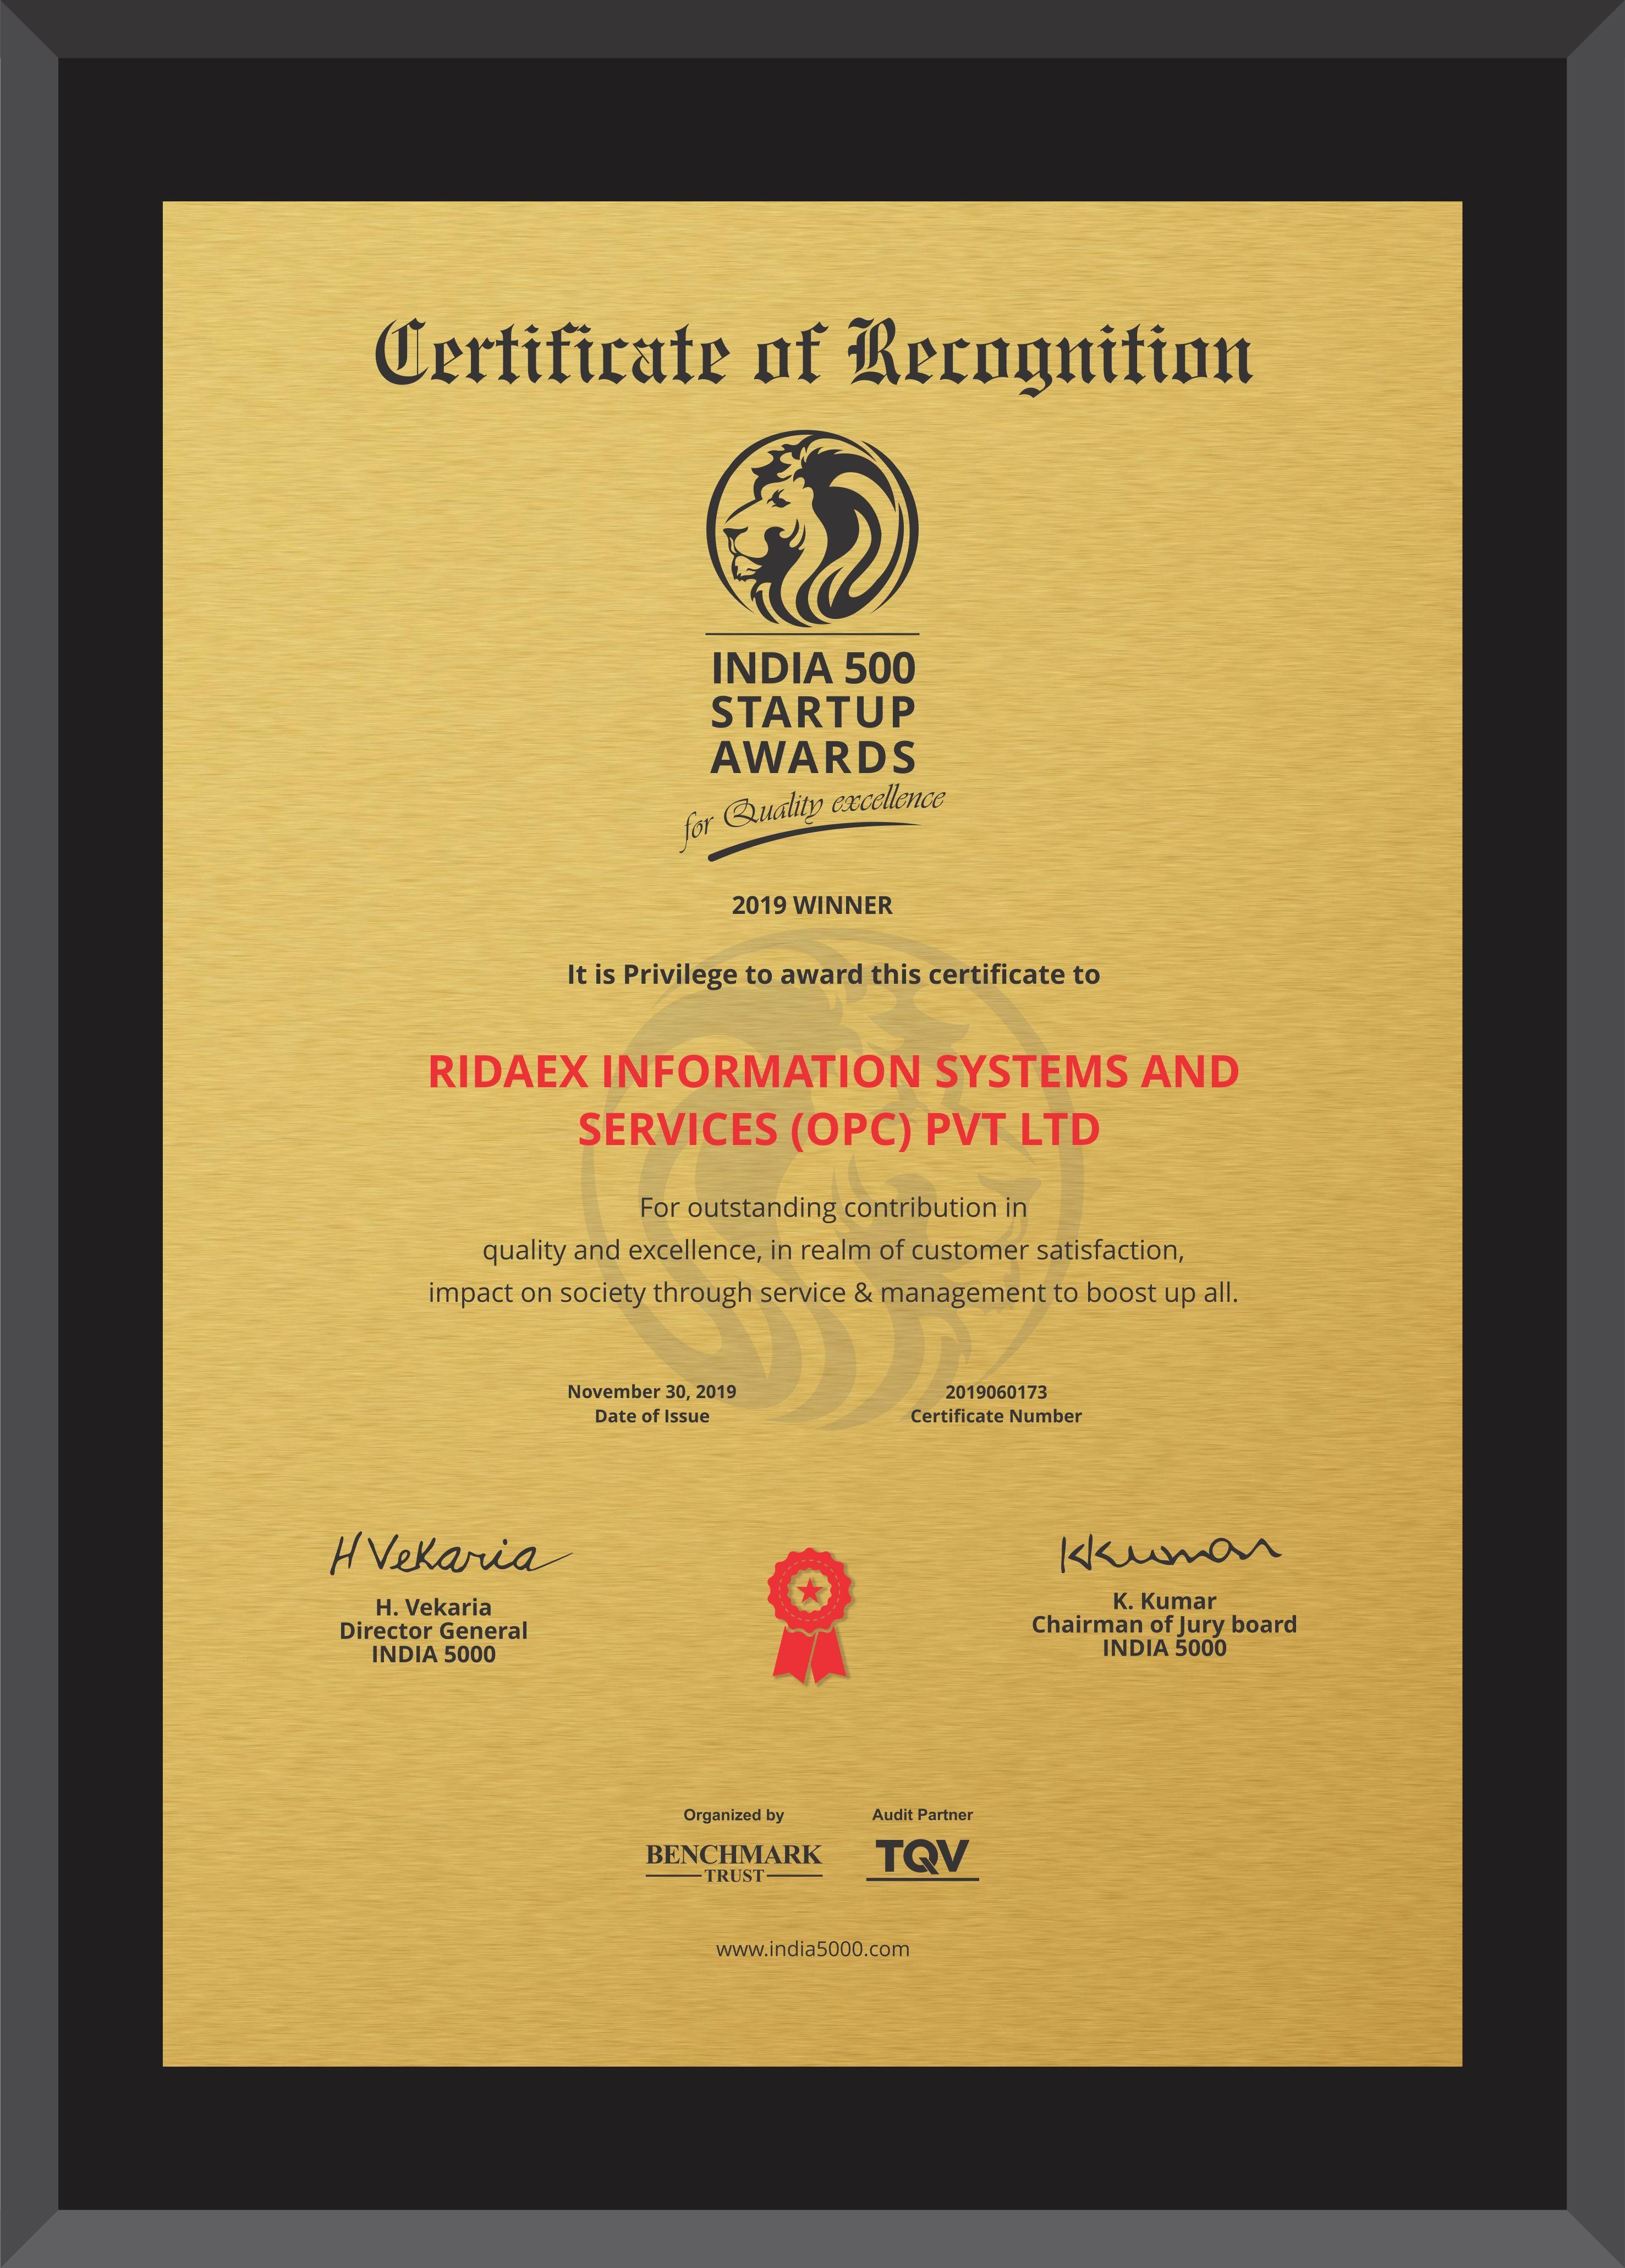 Ridaex India 5000 awards